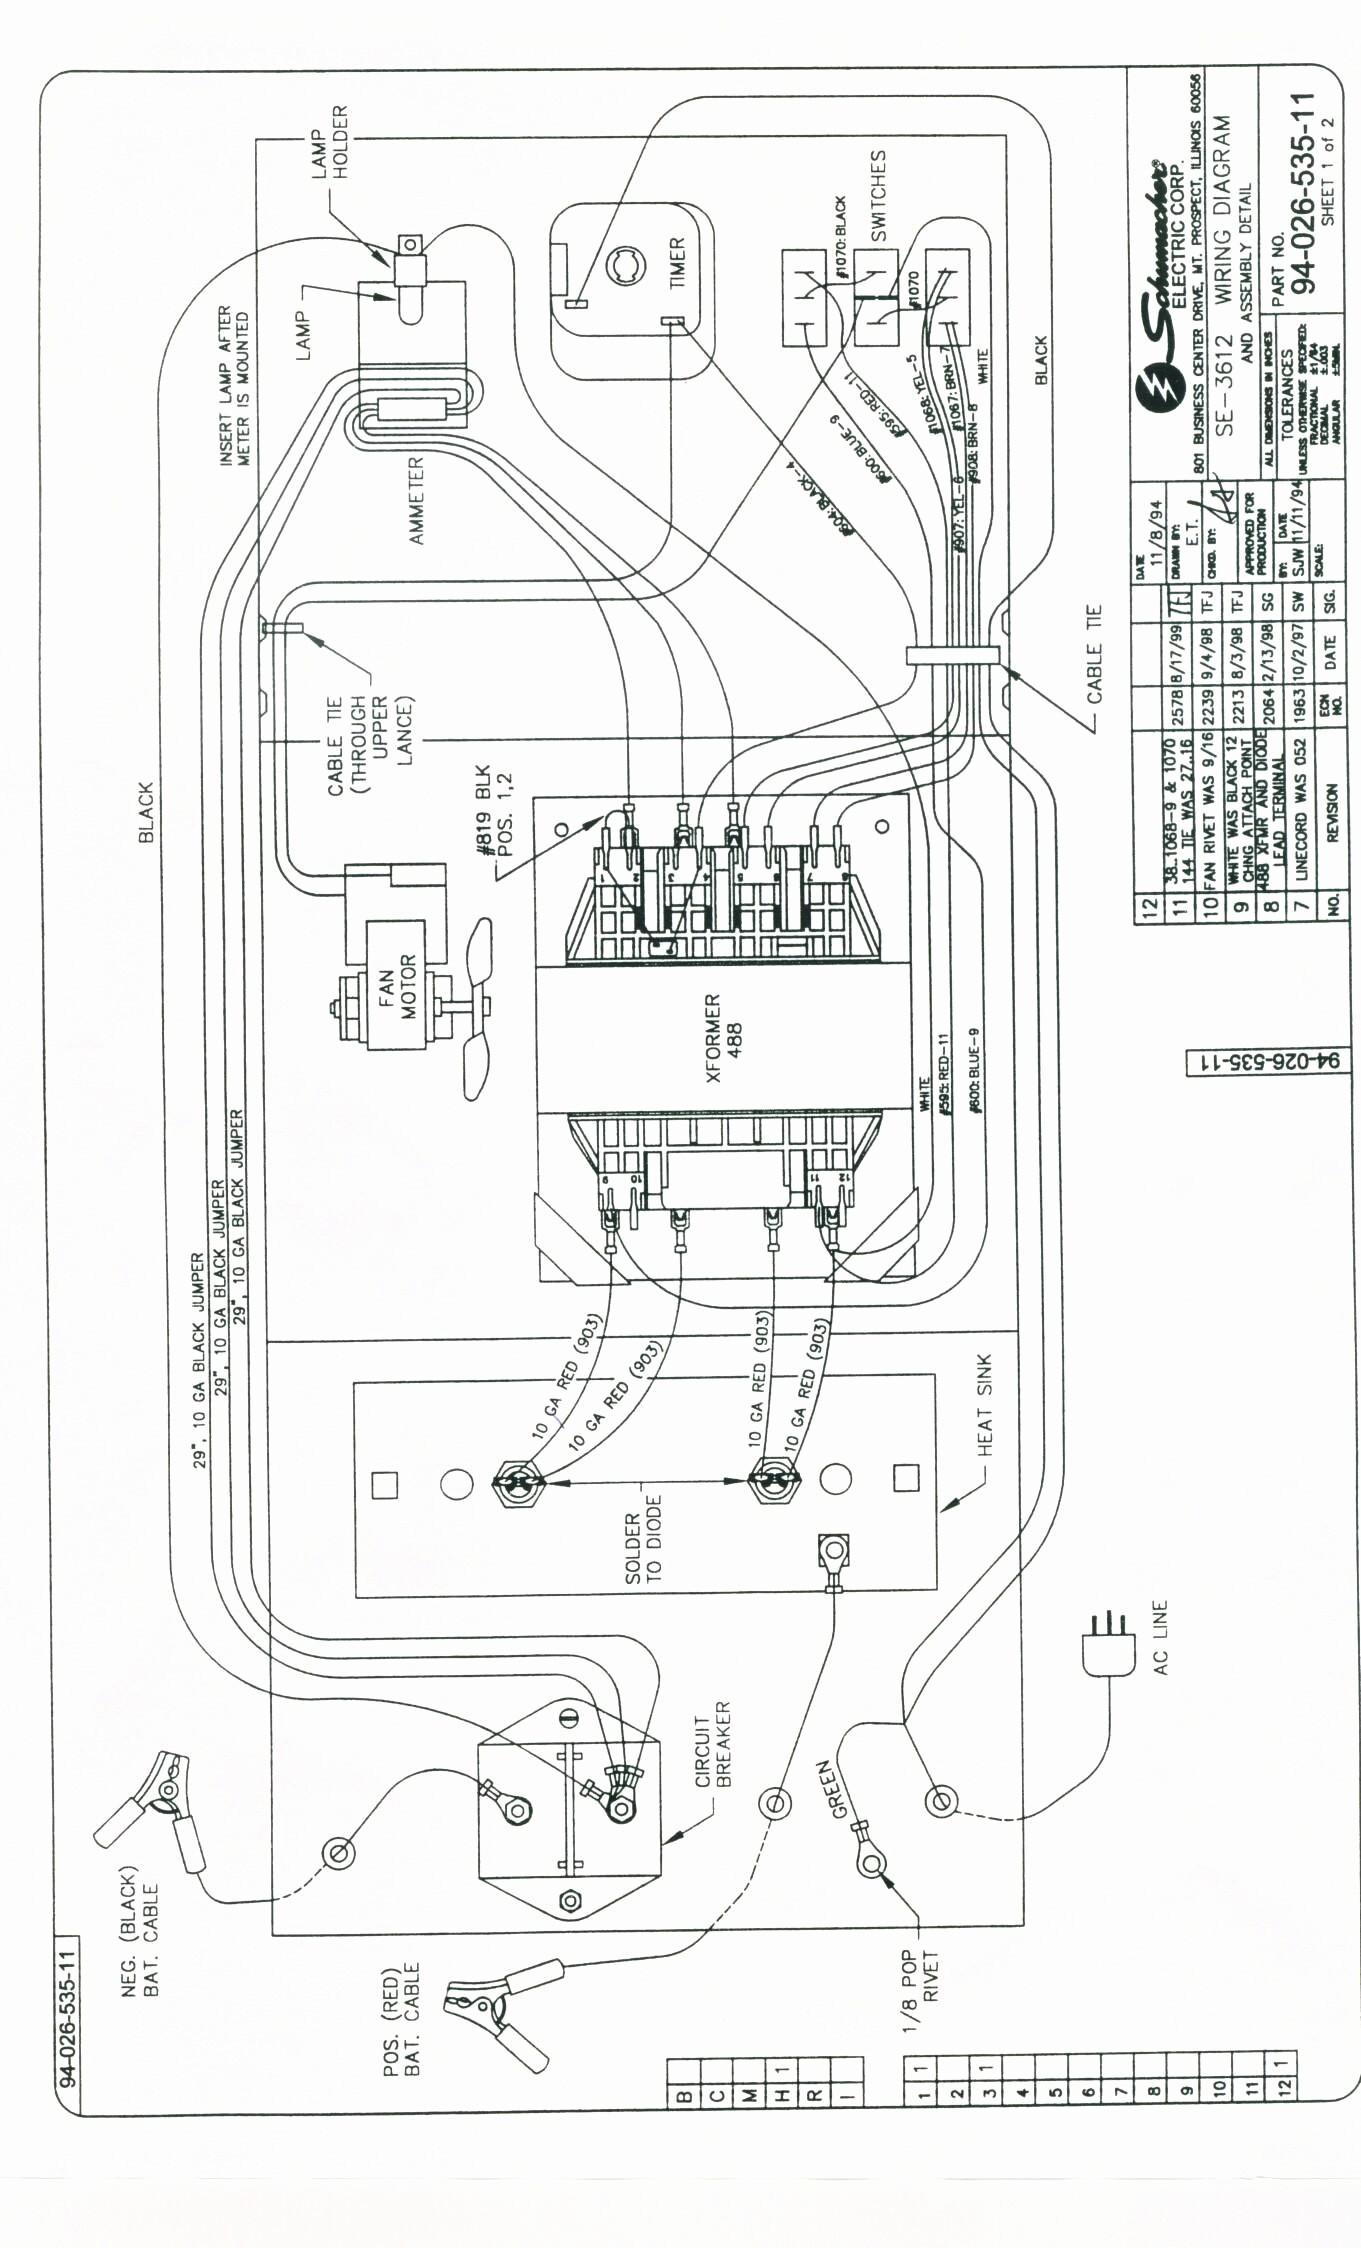 Schumacher Battery Charger Se 4020 Wiring Diagram New Schumacher Battery Charger Wiring Diagram Charger